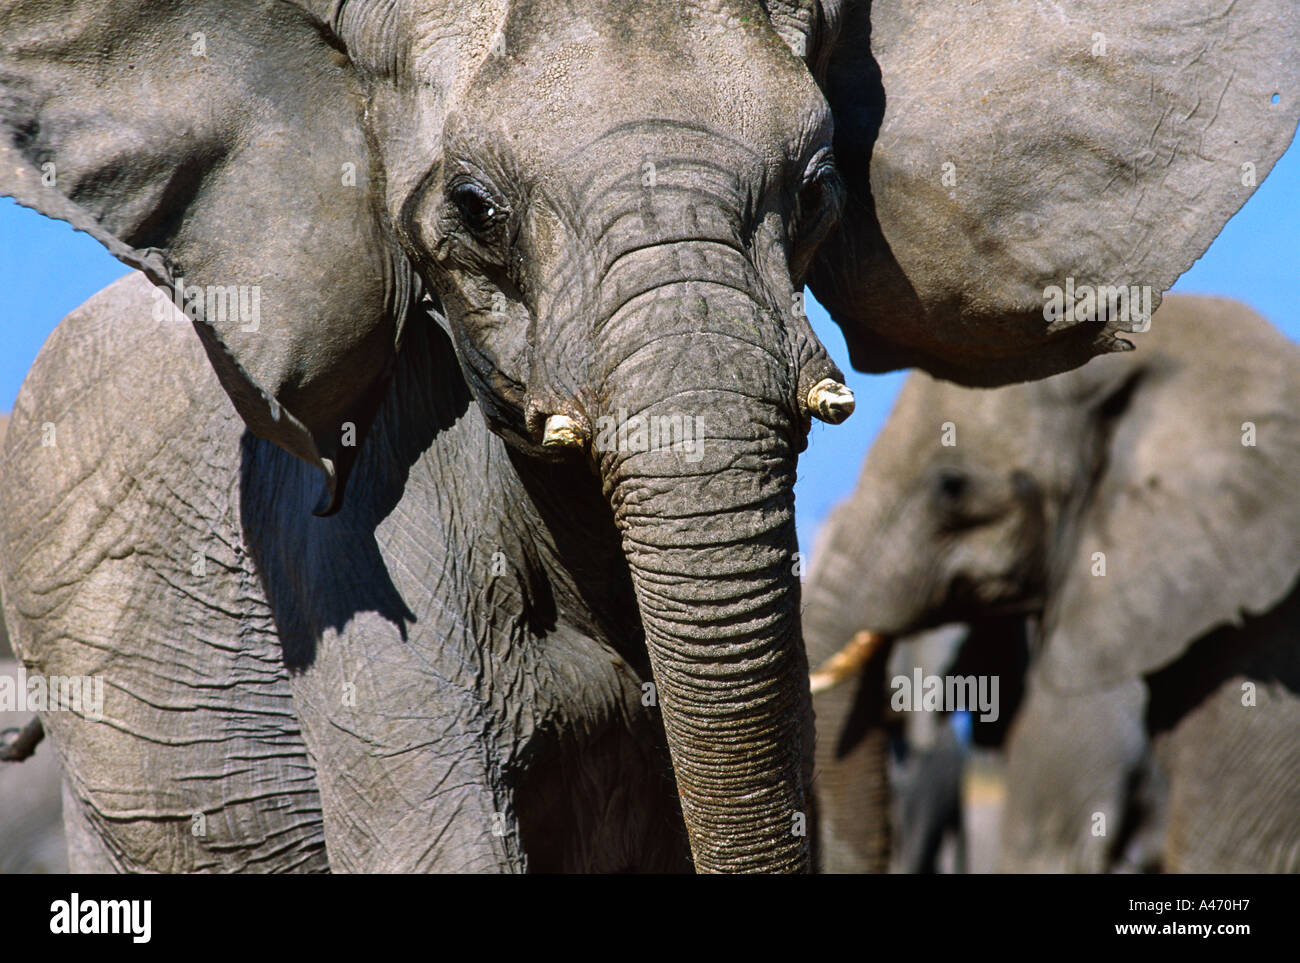 African elephant Loxodonta africana In aggressive posture Sub Saharan Africa - Stock Image